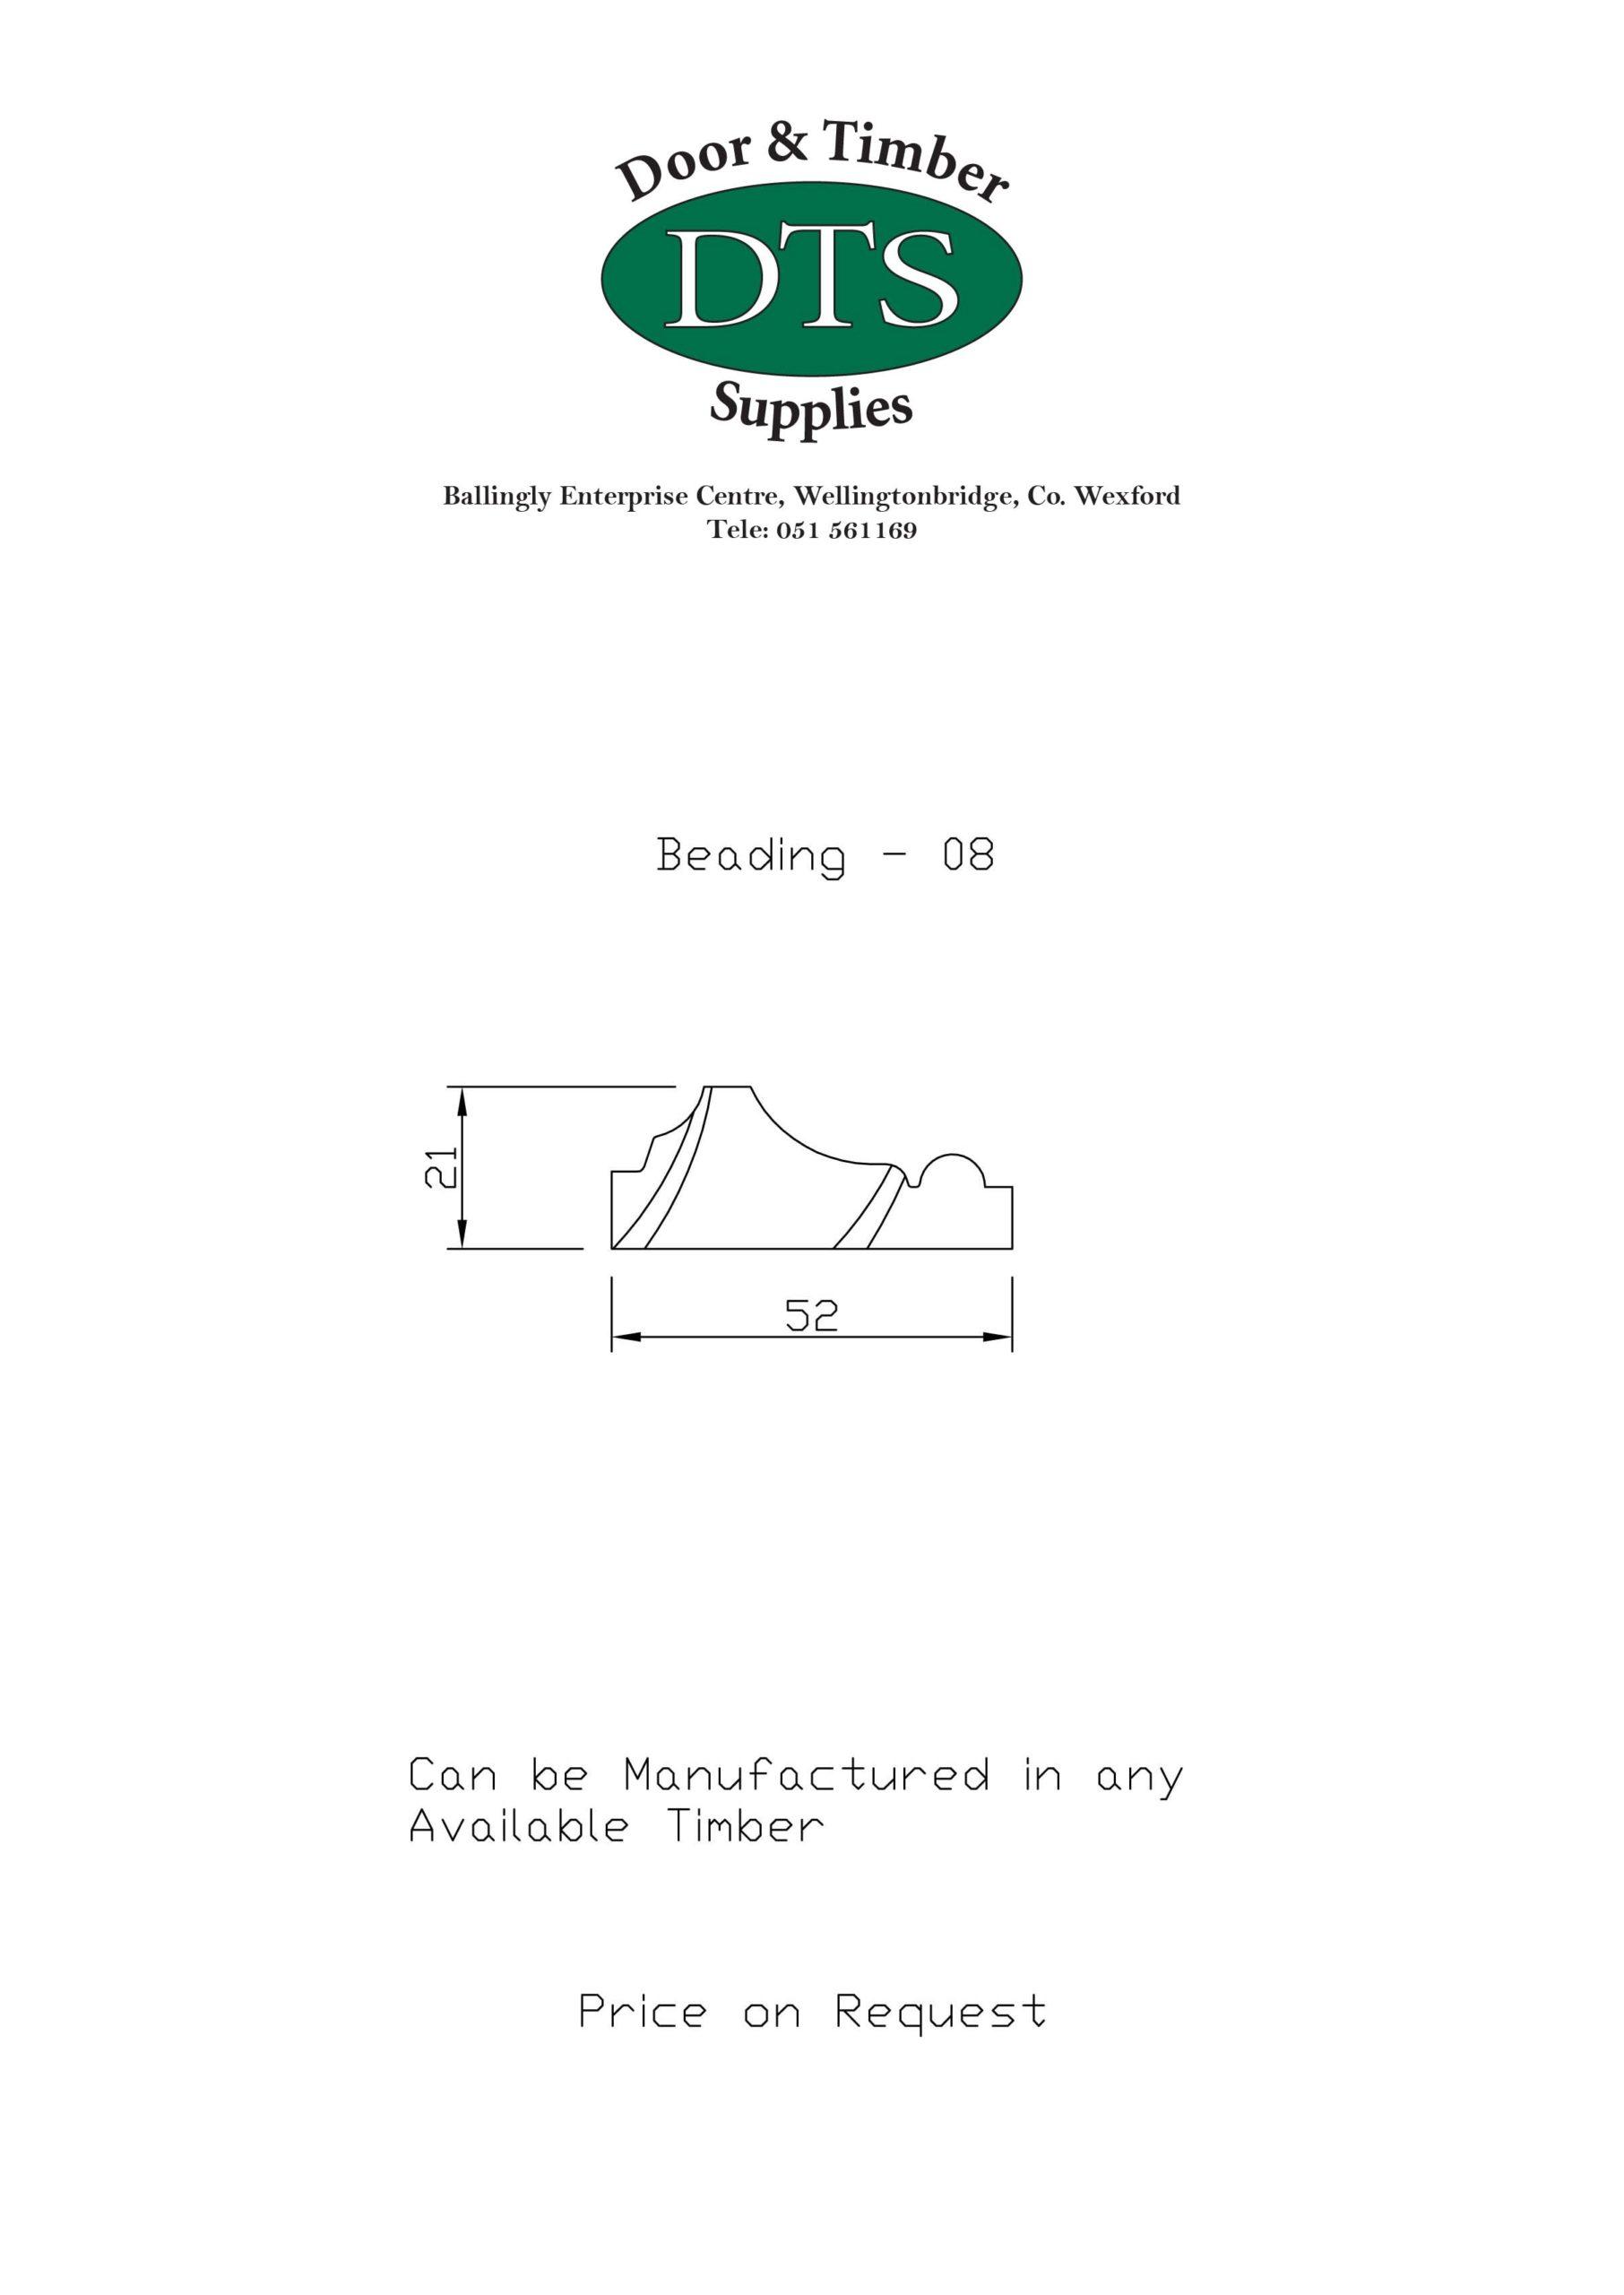 Door and Timber Supplies - Bespoke Beading